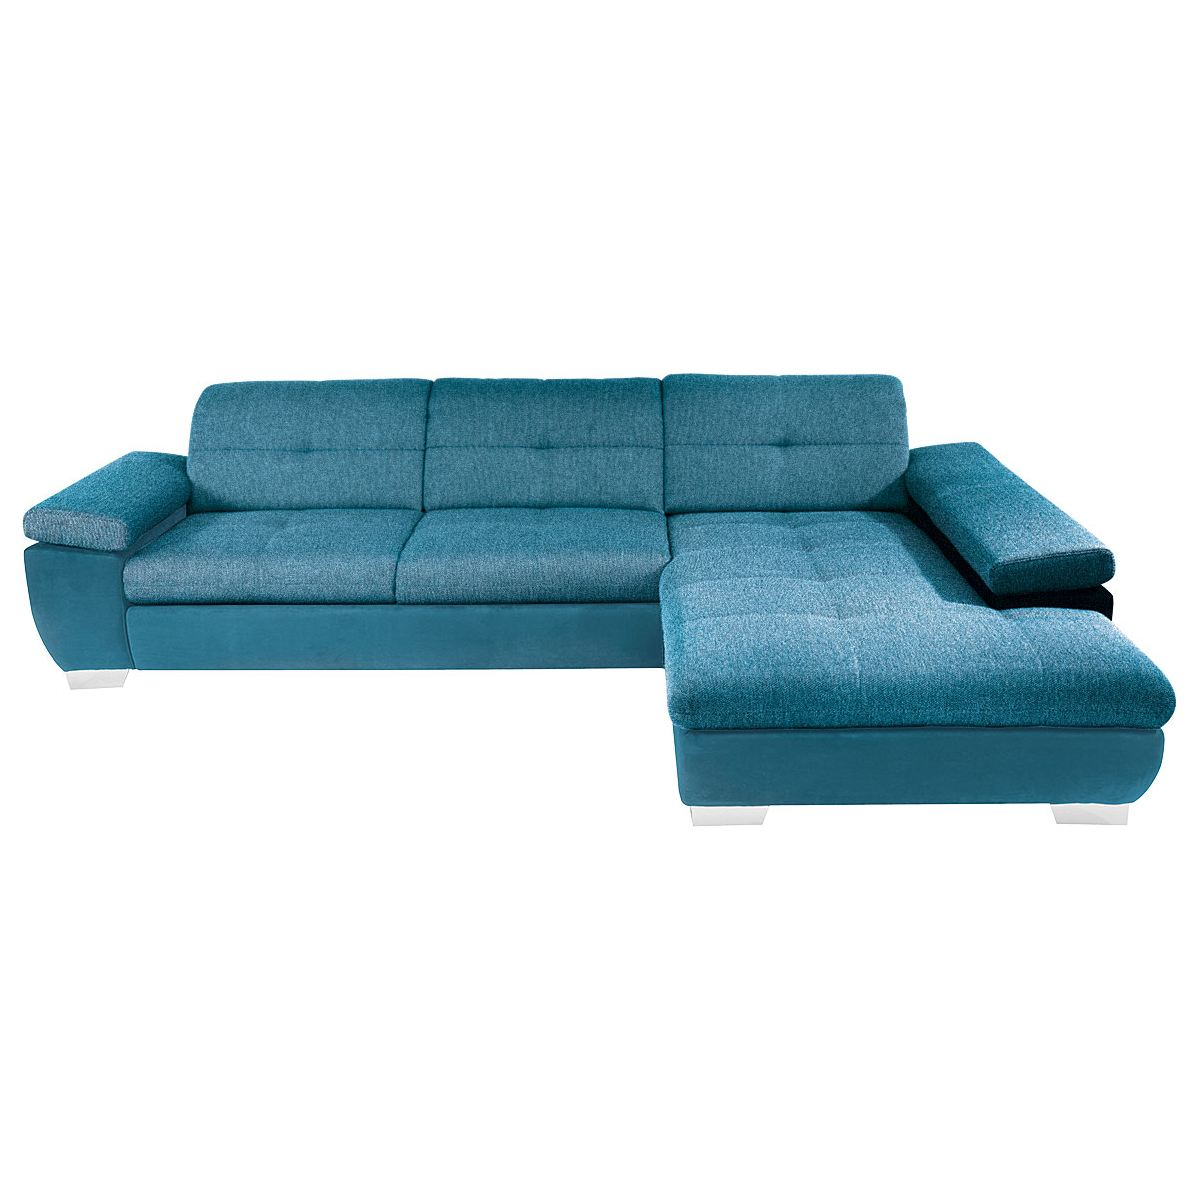 polsterecke t rkis eckgarnituren polsterm bel wohnen m bel boss. Black Bedroom Furniture Sets. Home Design Ideas